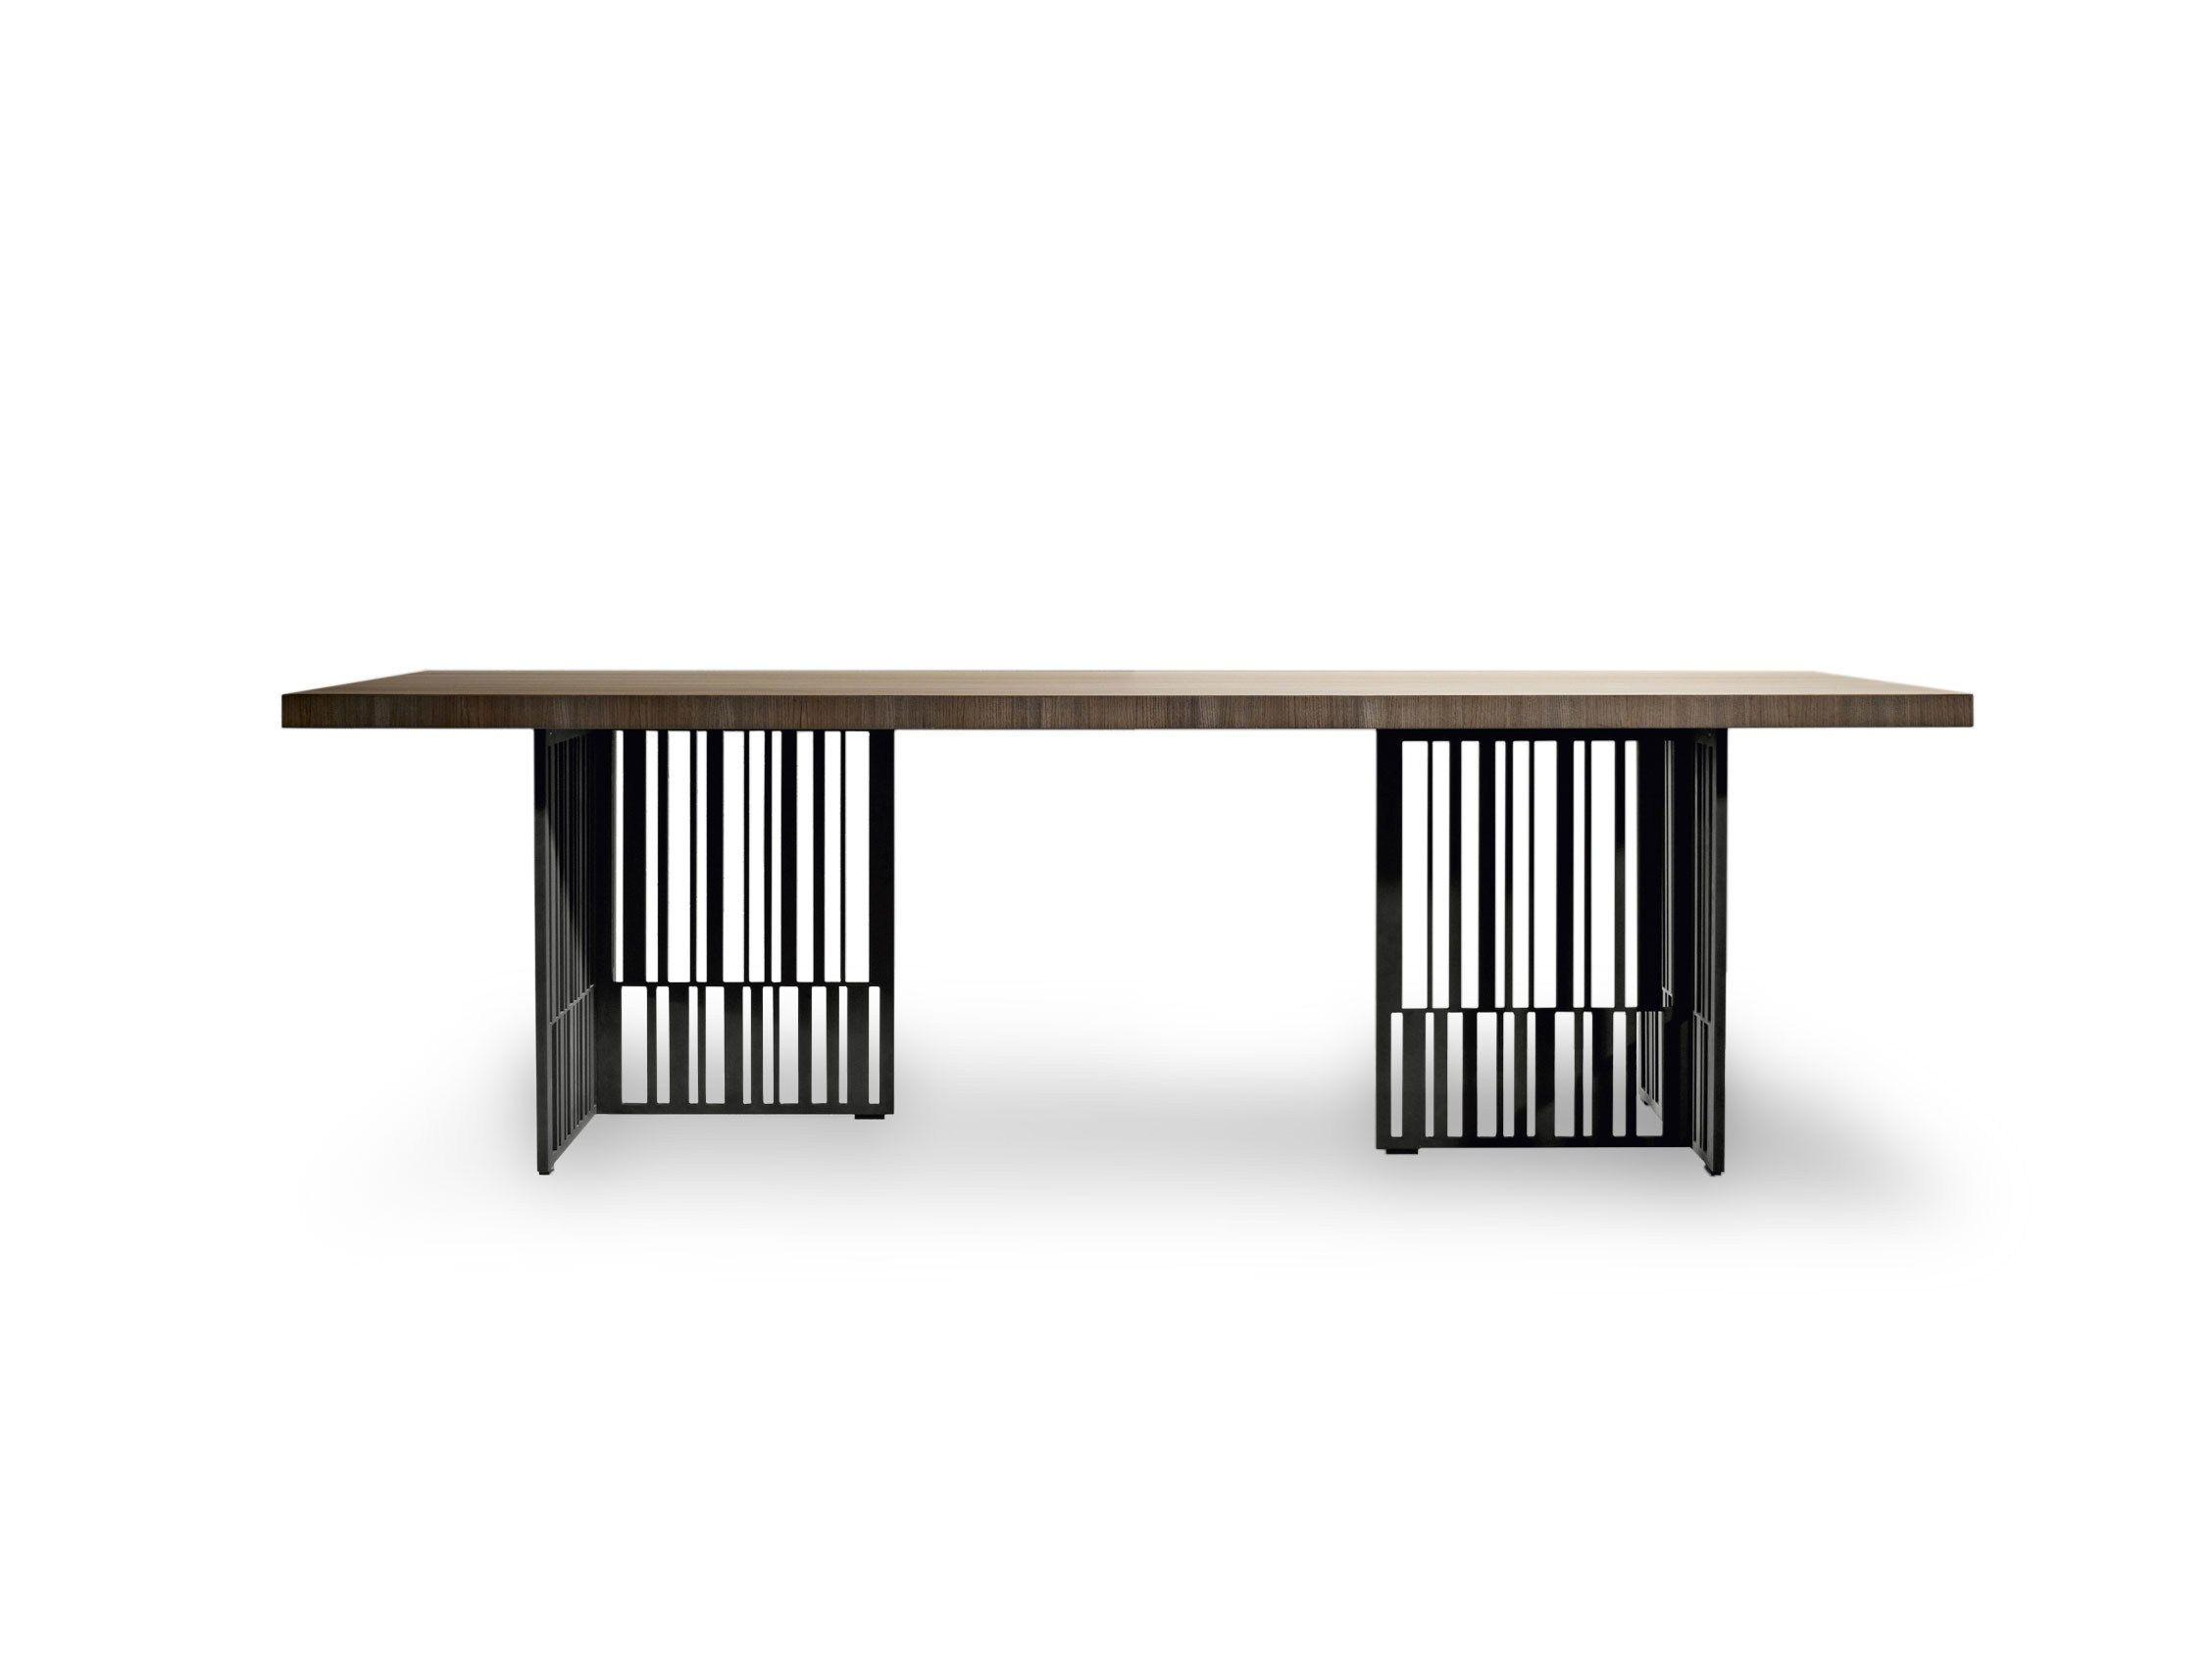 Rectangular elm table codex by molteni design patricia urquiola - Table basse molteni ...